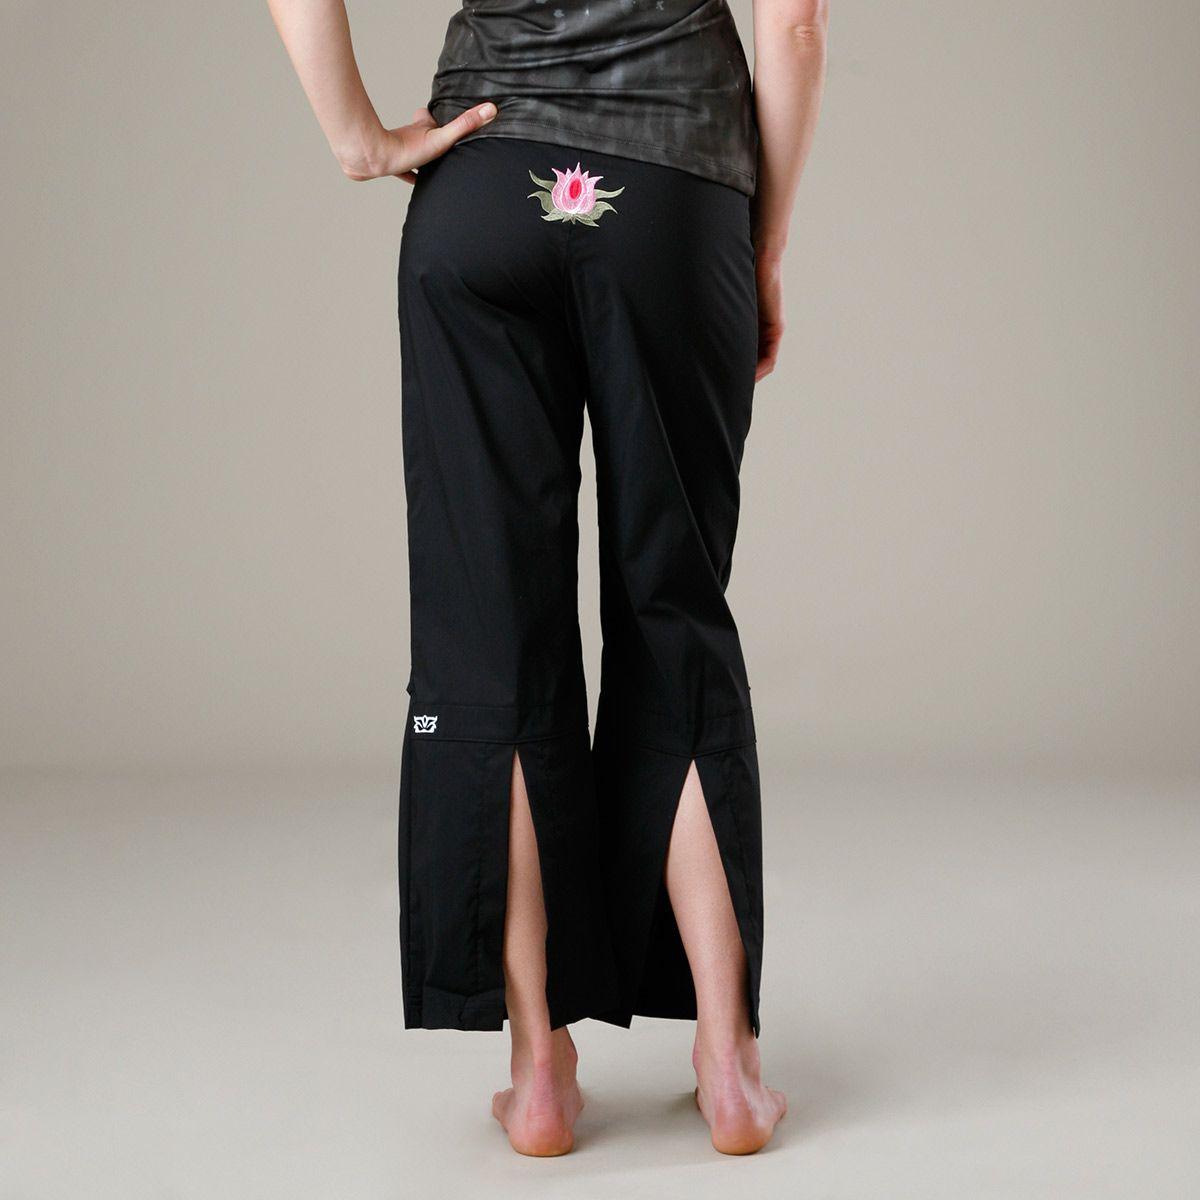 Lotus Agility Pant Back Slits Vickerey Style Pinterest